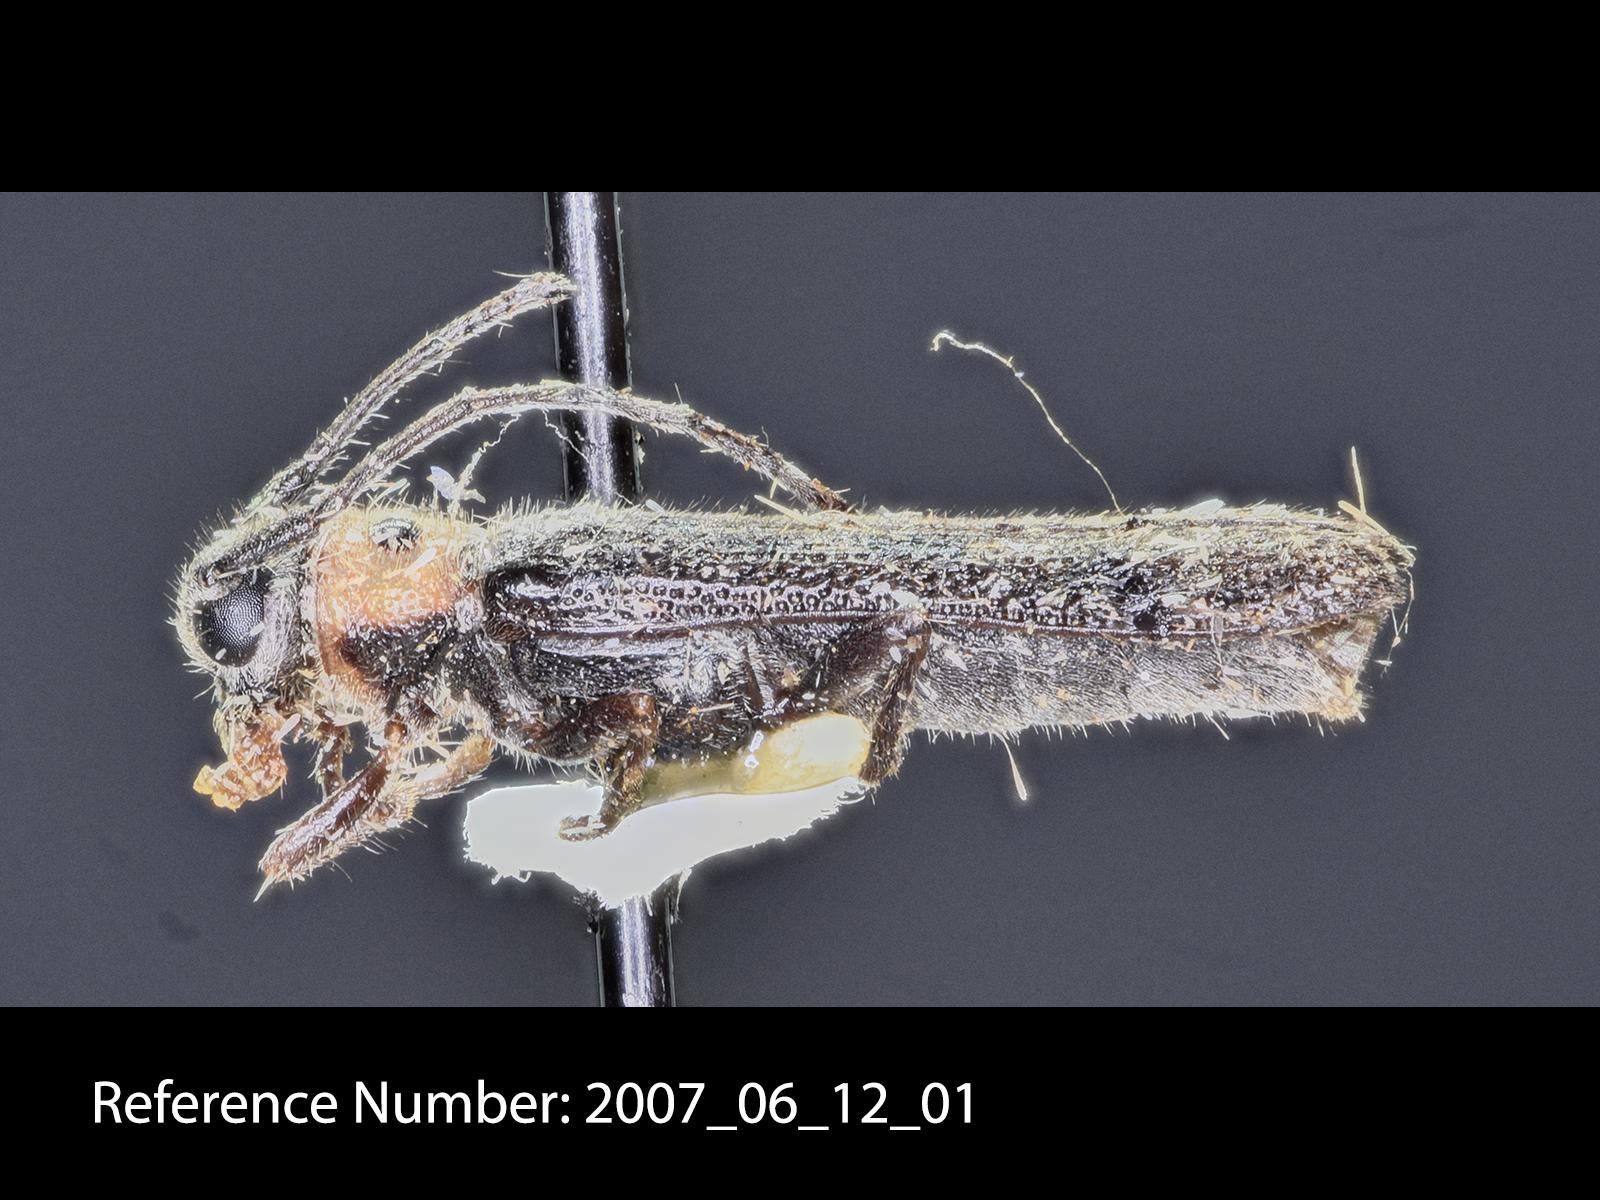 Oberea pruinosa lateral view